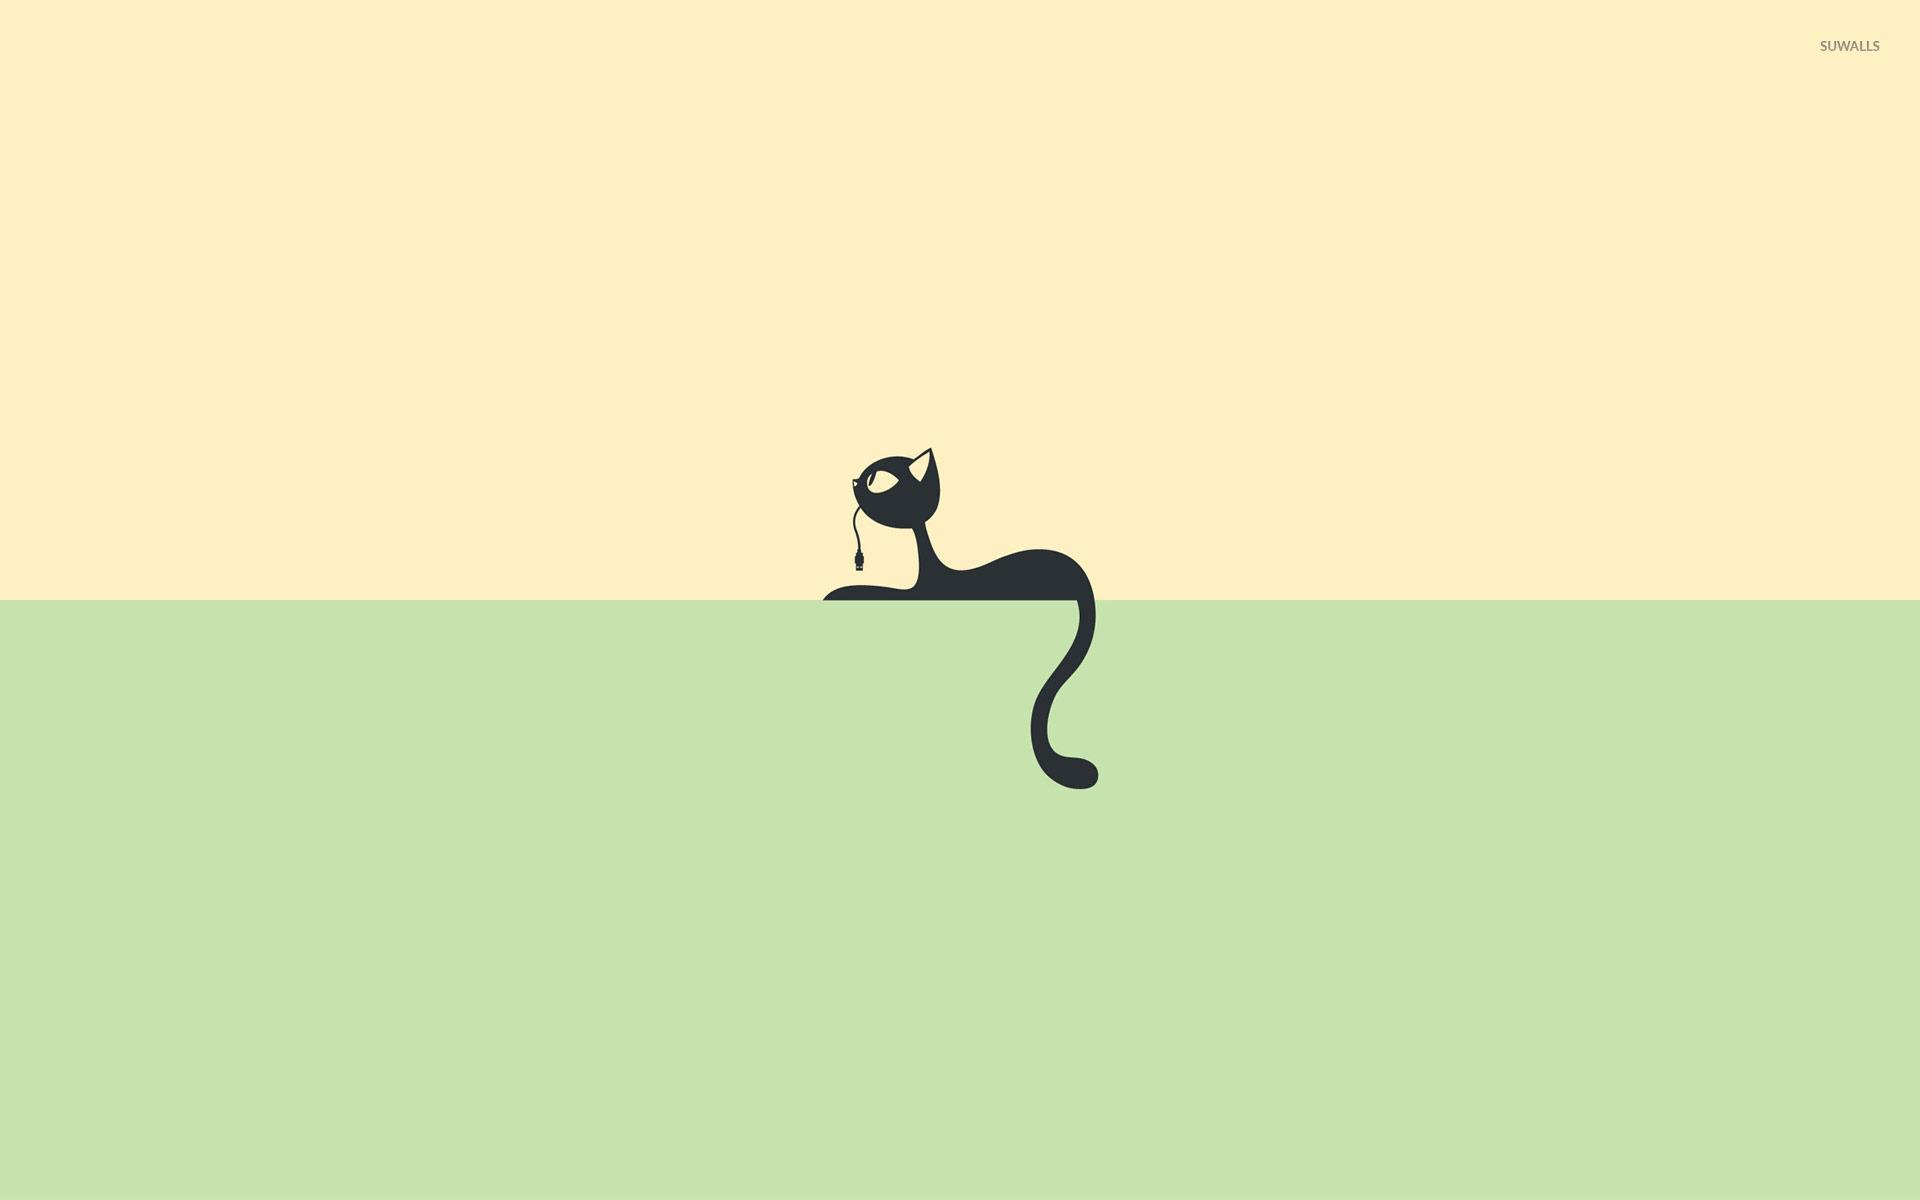 Game Of Thrones Quotes Desktop Wallpaper Black Cat On A Shelf Wallpaper Minimalistic Wallpapers